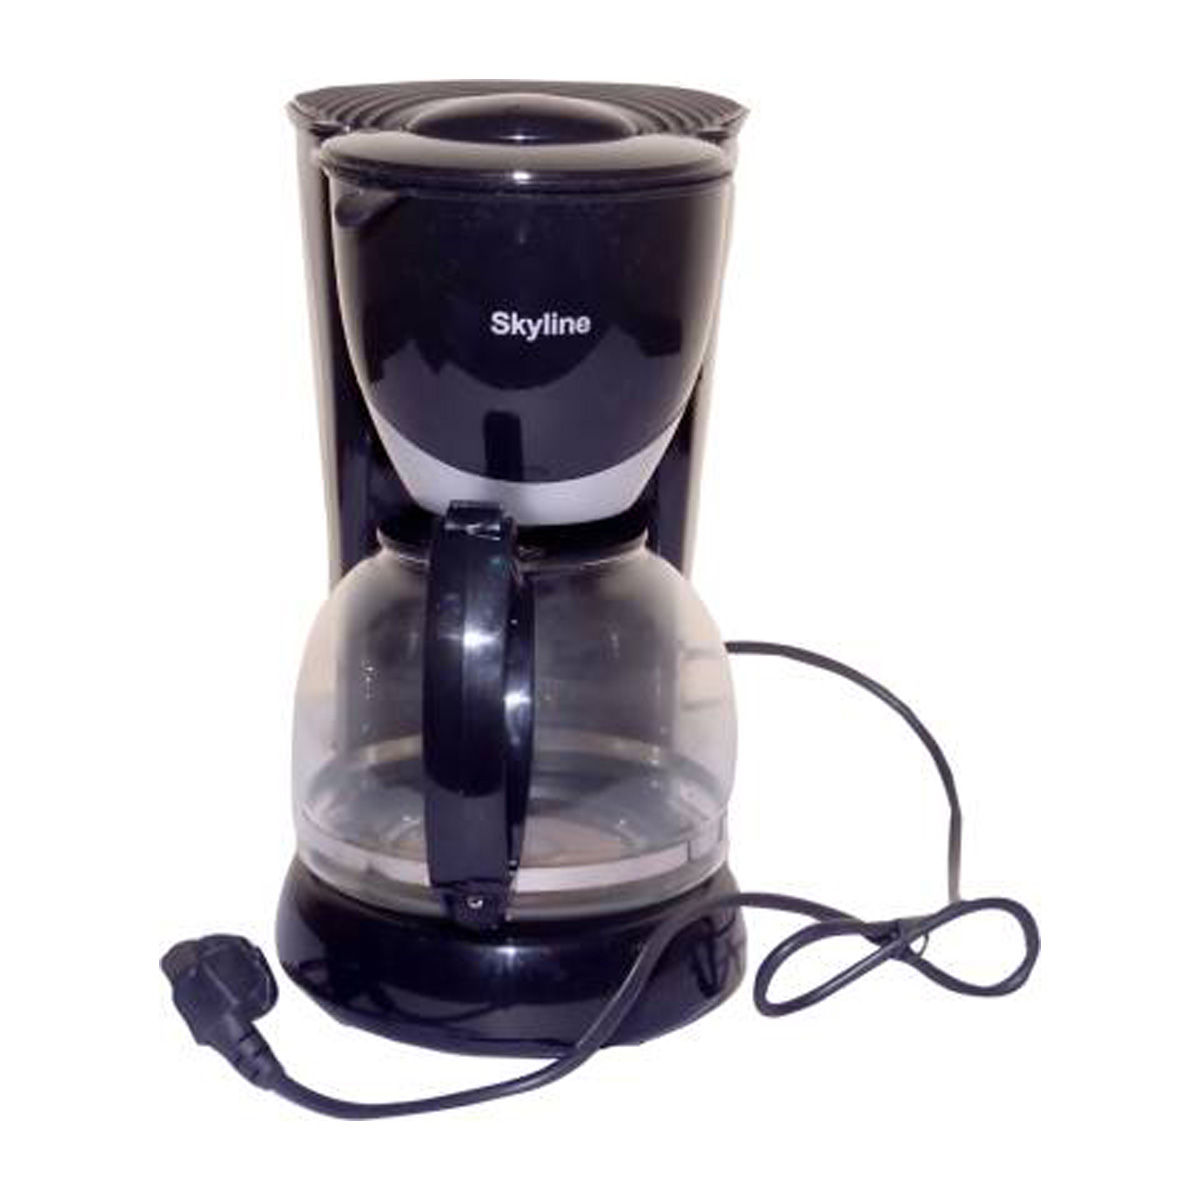 Skyline Sky4 6 cups Coffee Maker